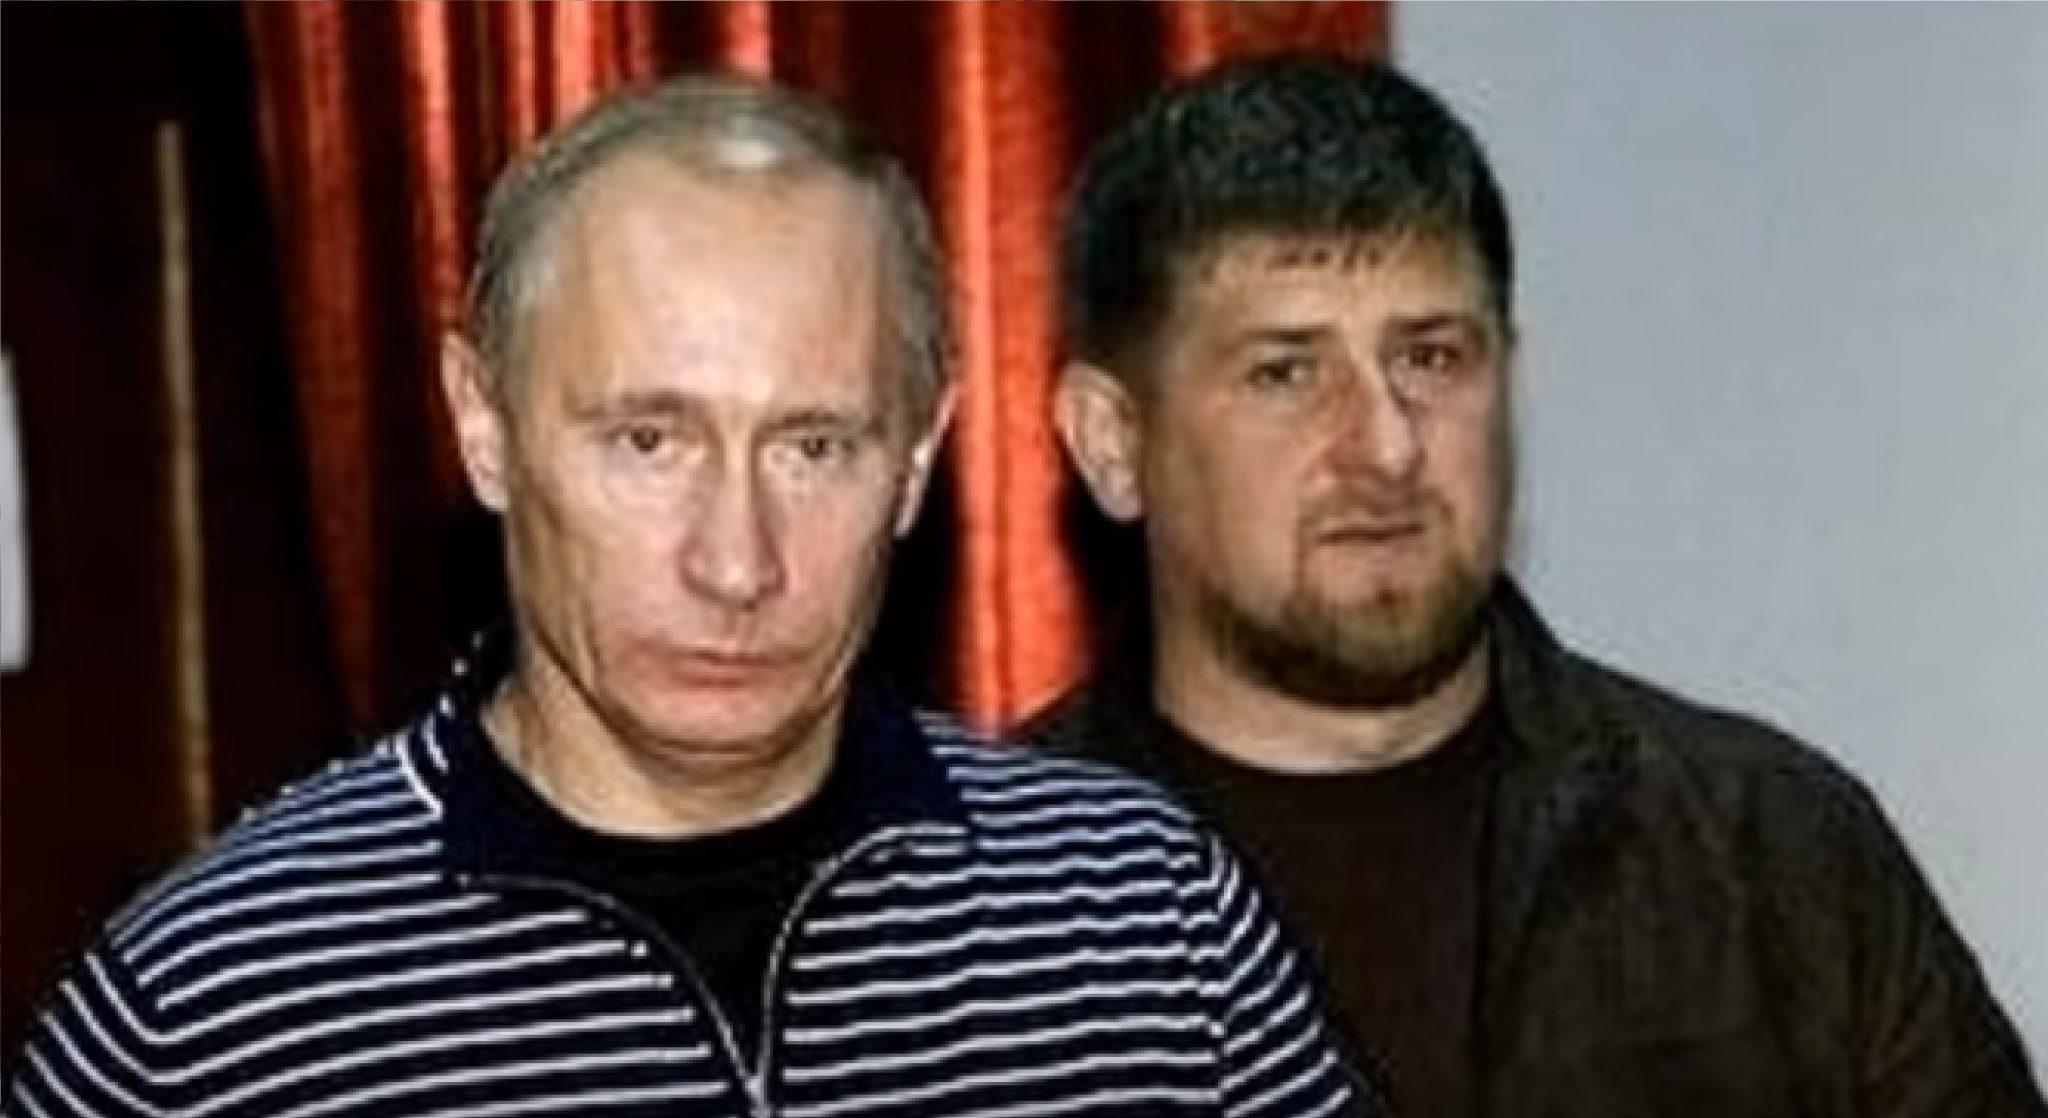 Velký a malý autokrat. V. V. Putin a Ramzan Kadyrov. (youtube)